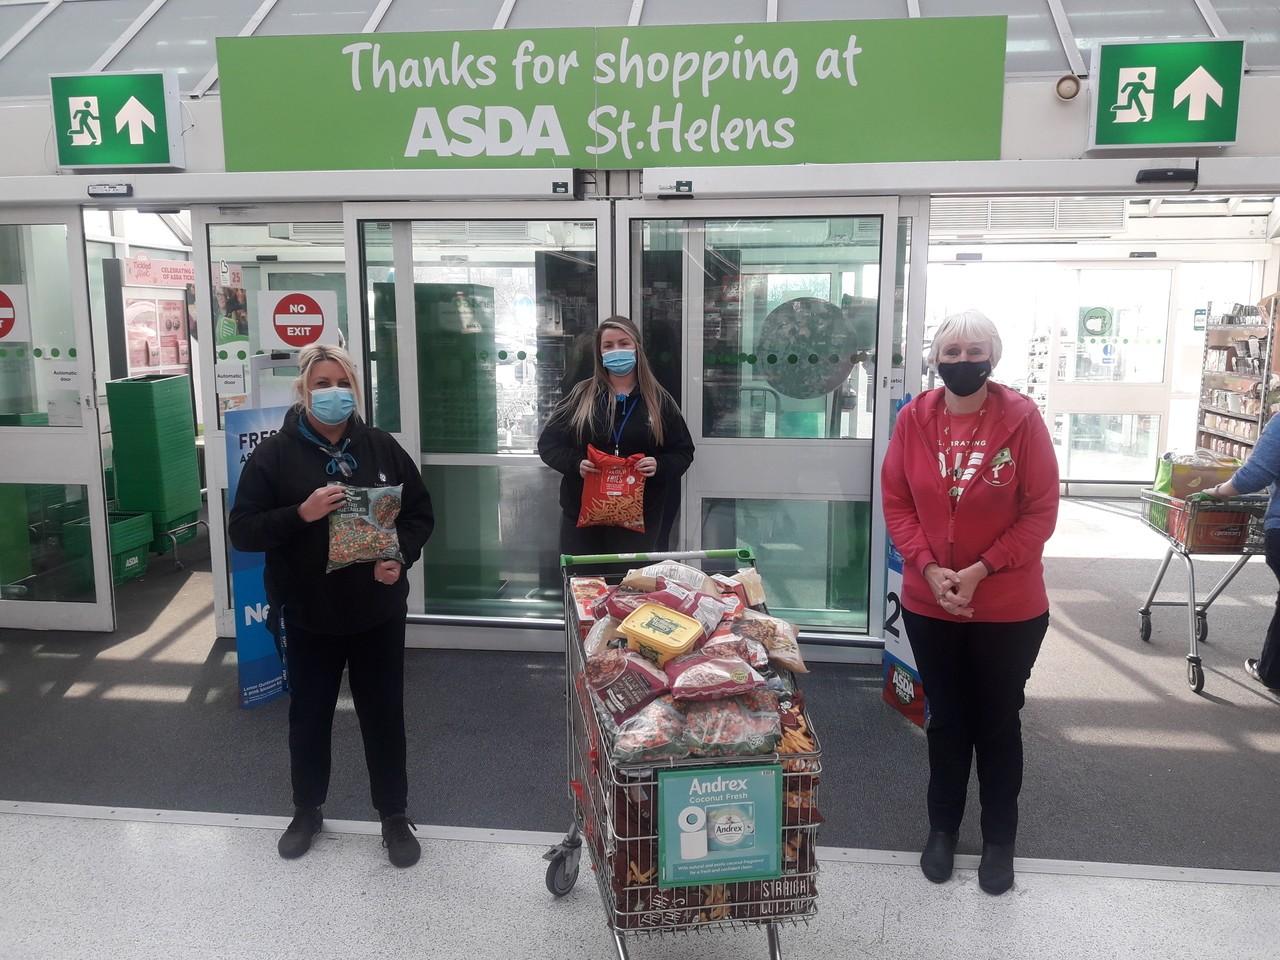 Asda St Helen's donates... | Asda St Helens